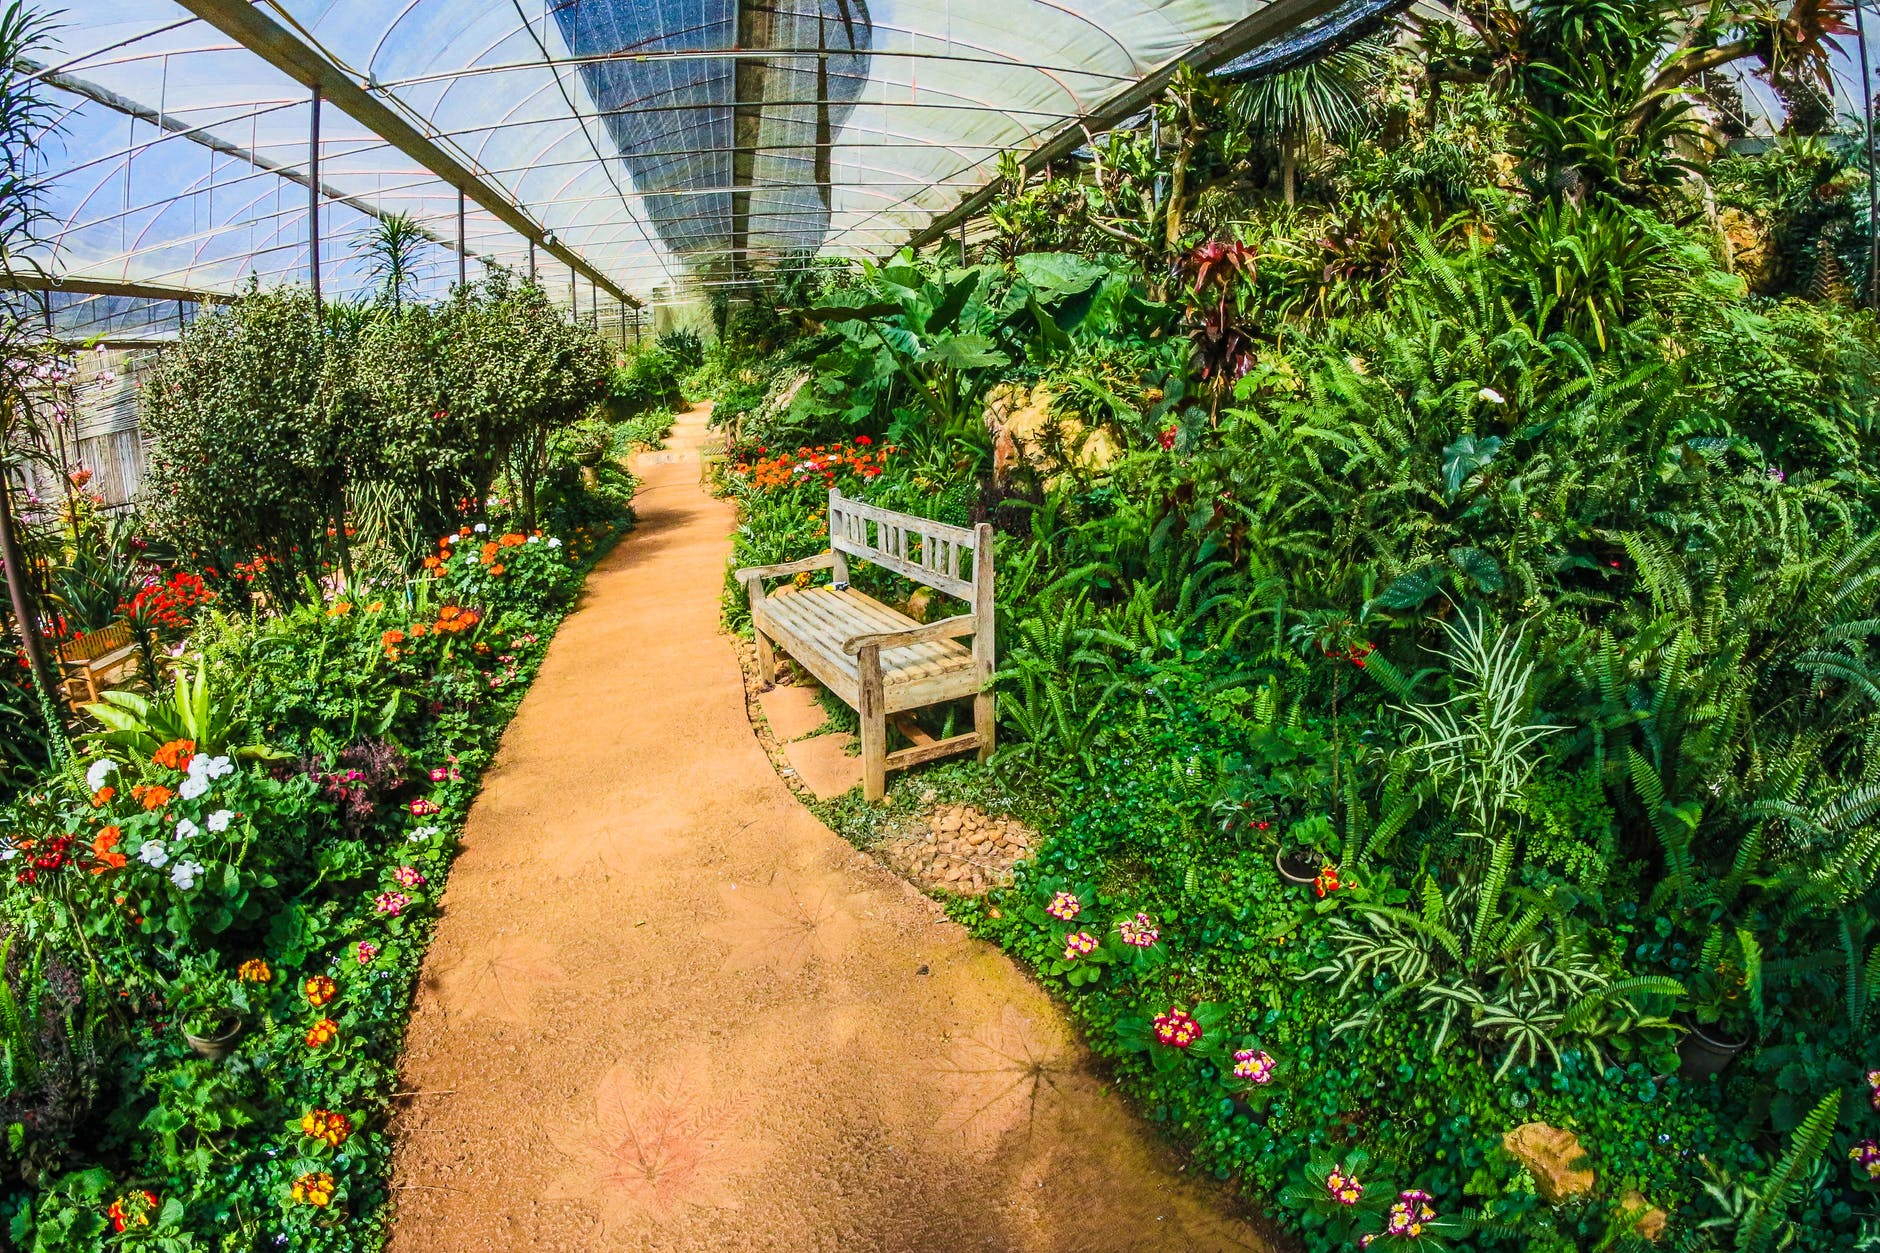 Indoor Gardening Vs. Outdoor Gardening – Which One You Should Prefer